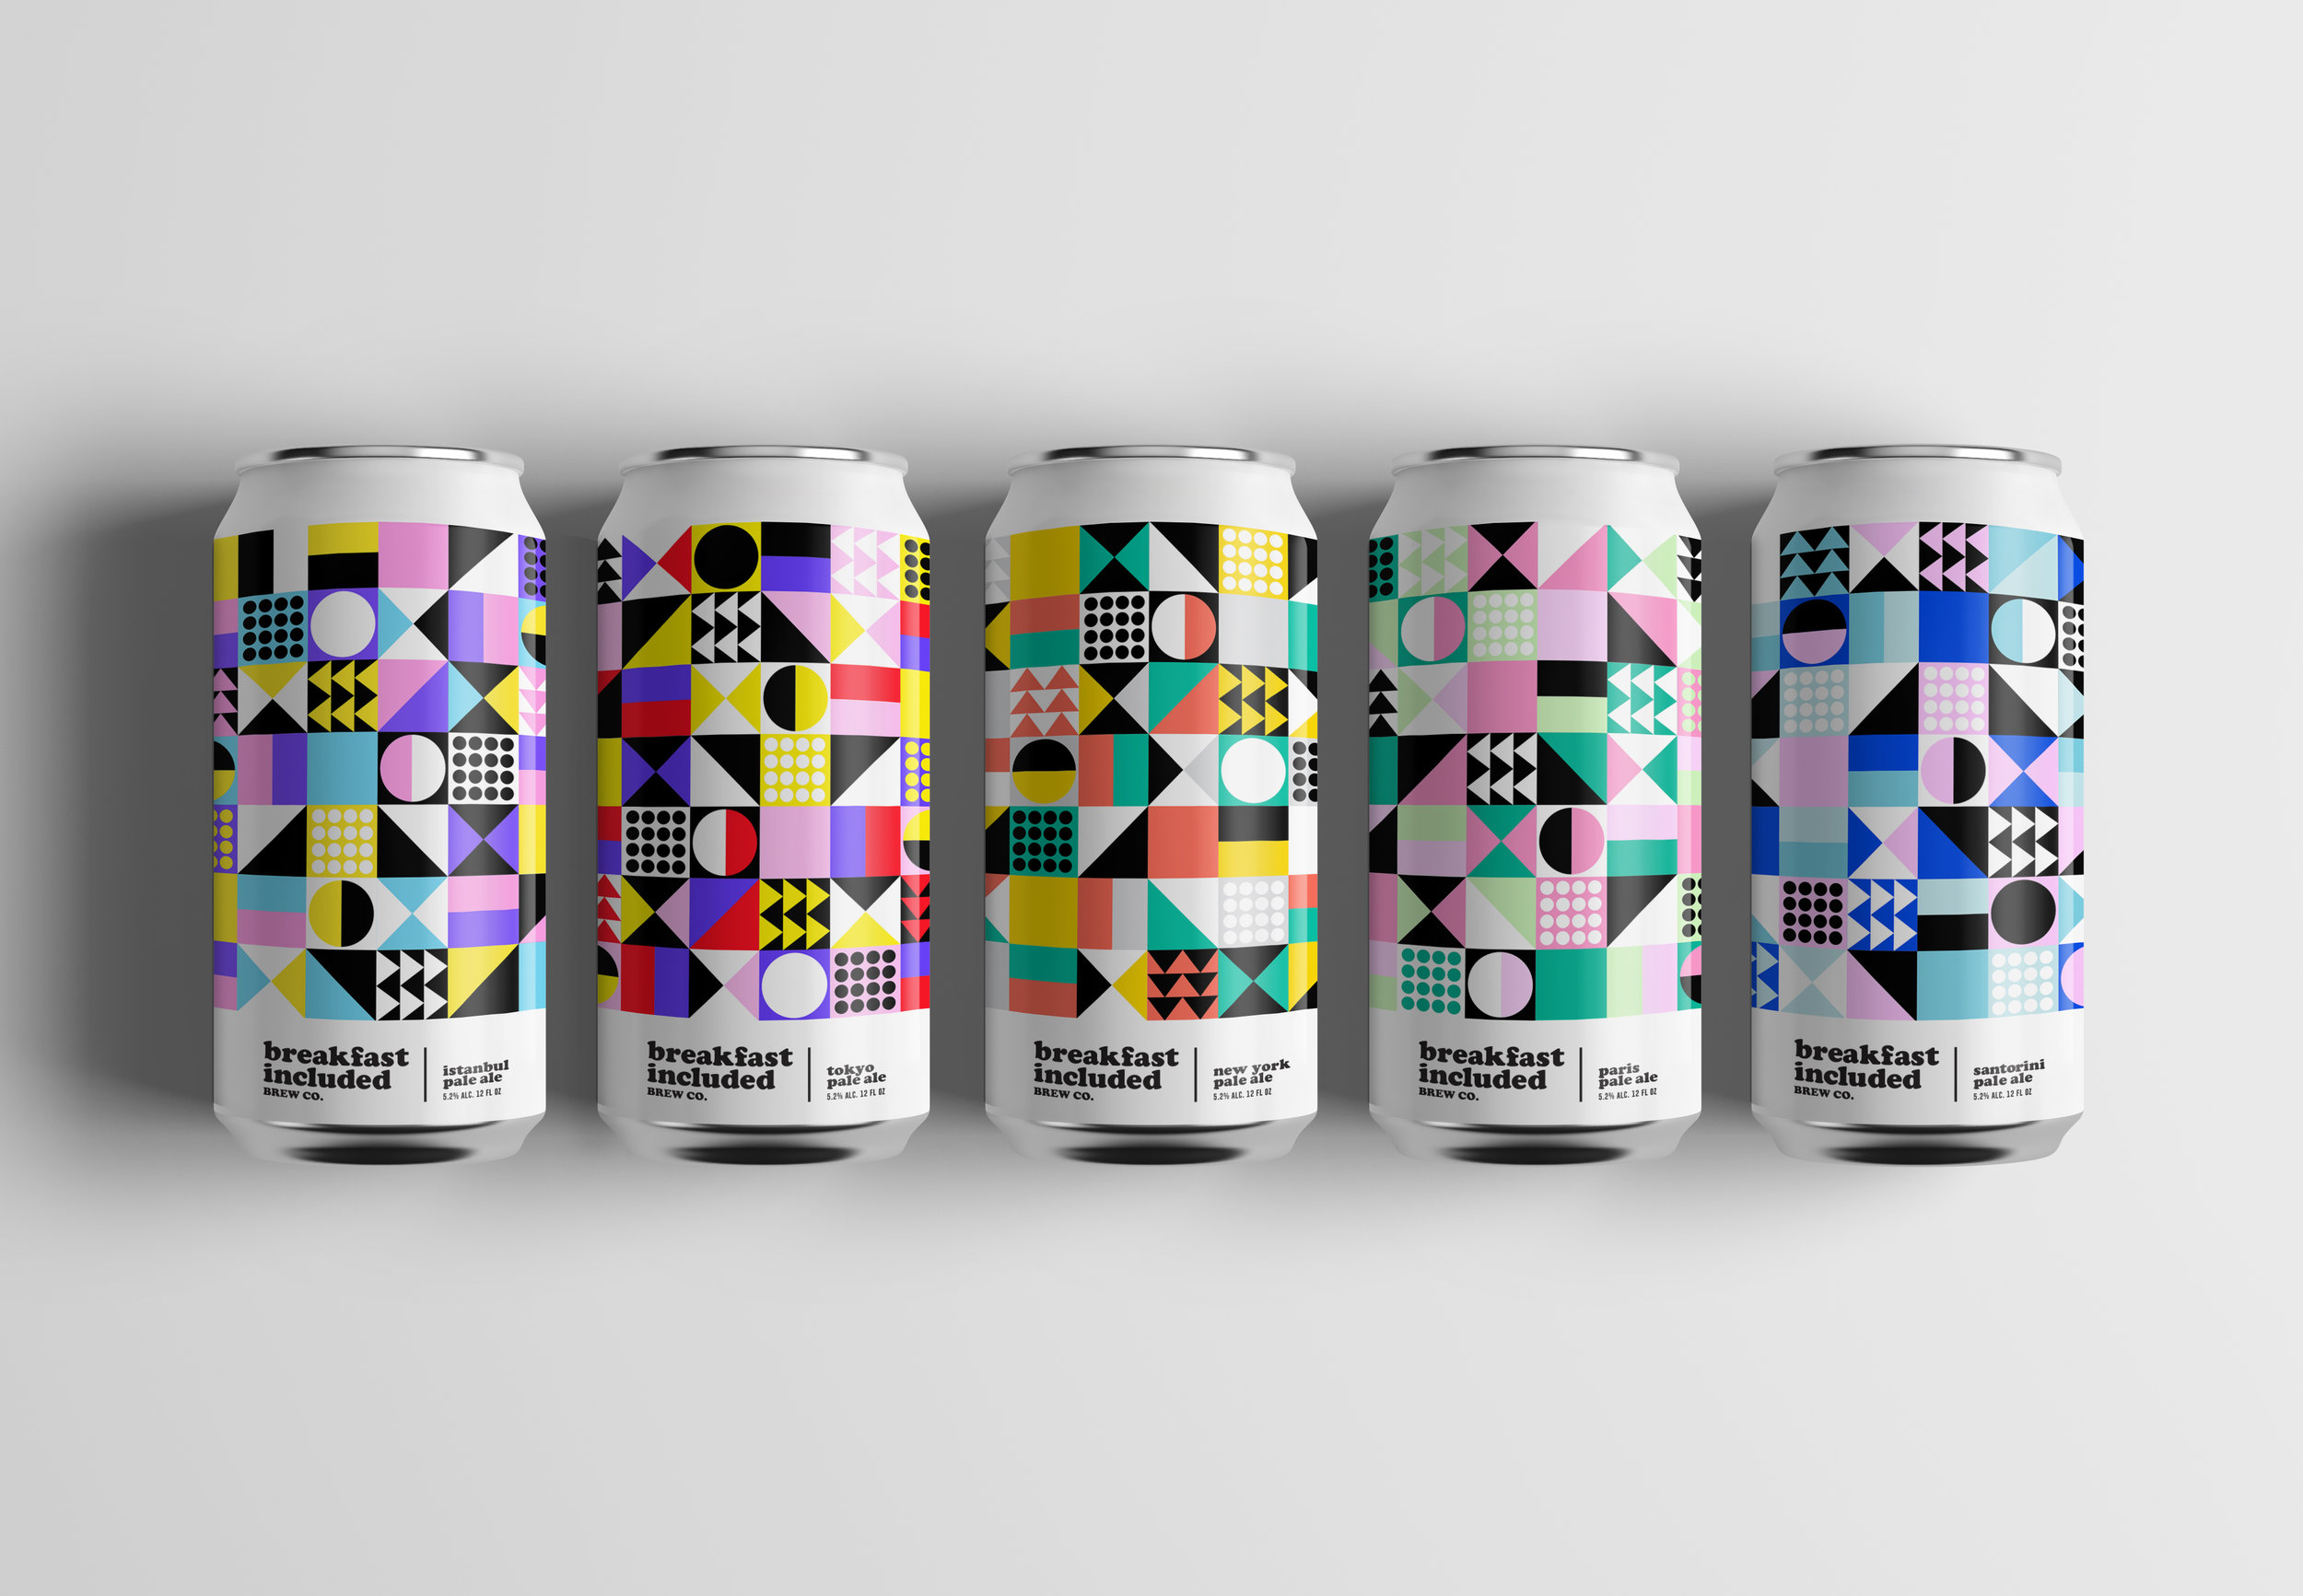 Full set of beer.jpg